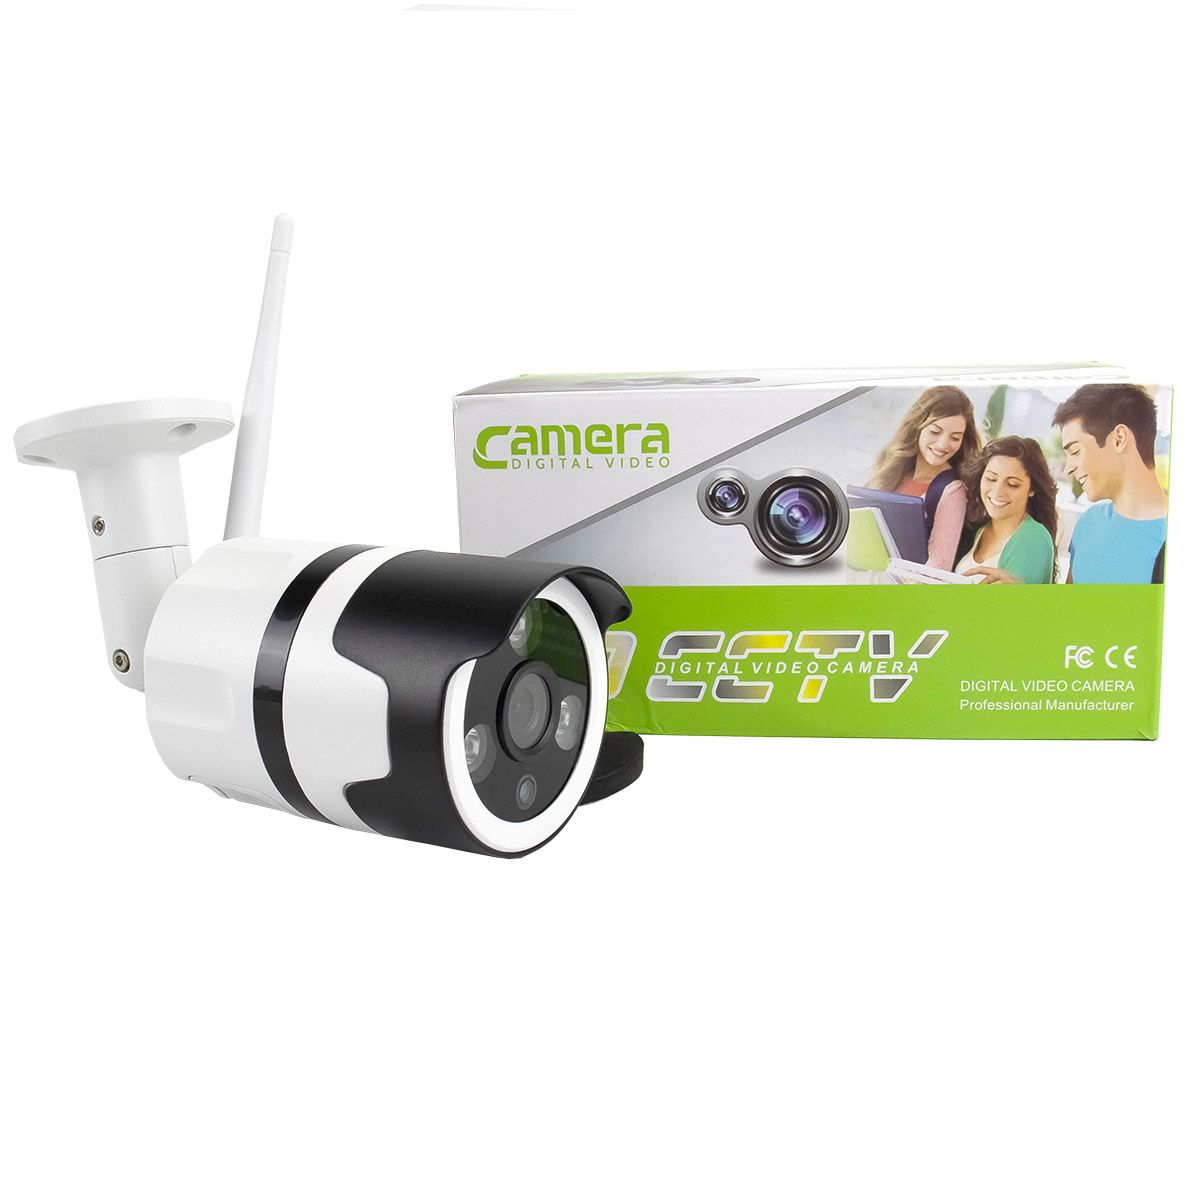 KIT 2x Câmera IP Digital Externa Full HD à Prova D'água com Visão Noturna 1080p XA-N632 + 2x Cartão Micro SD 32GB